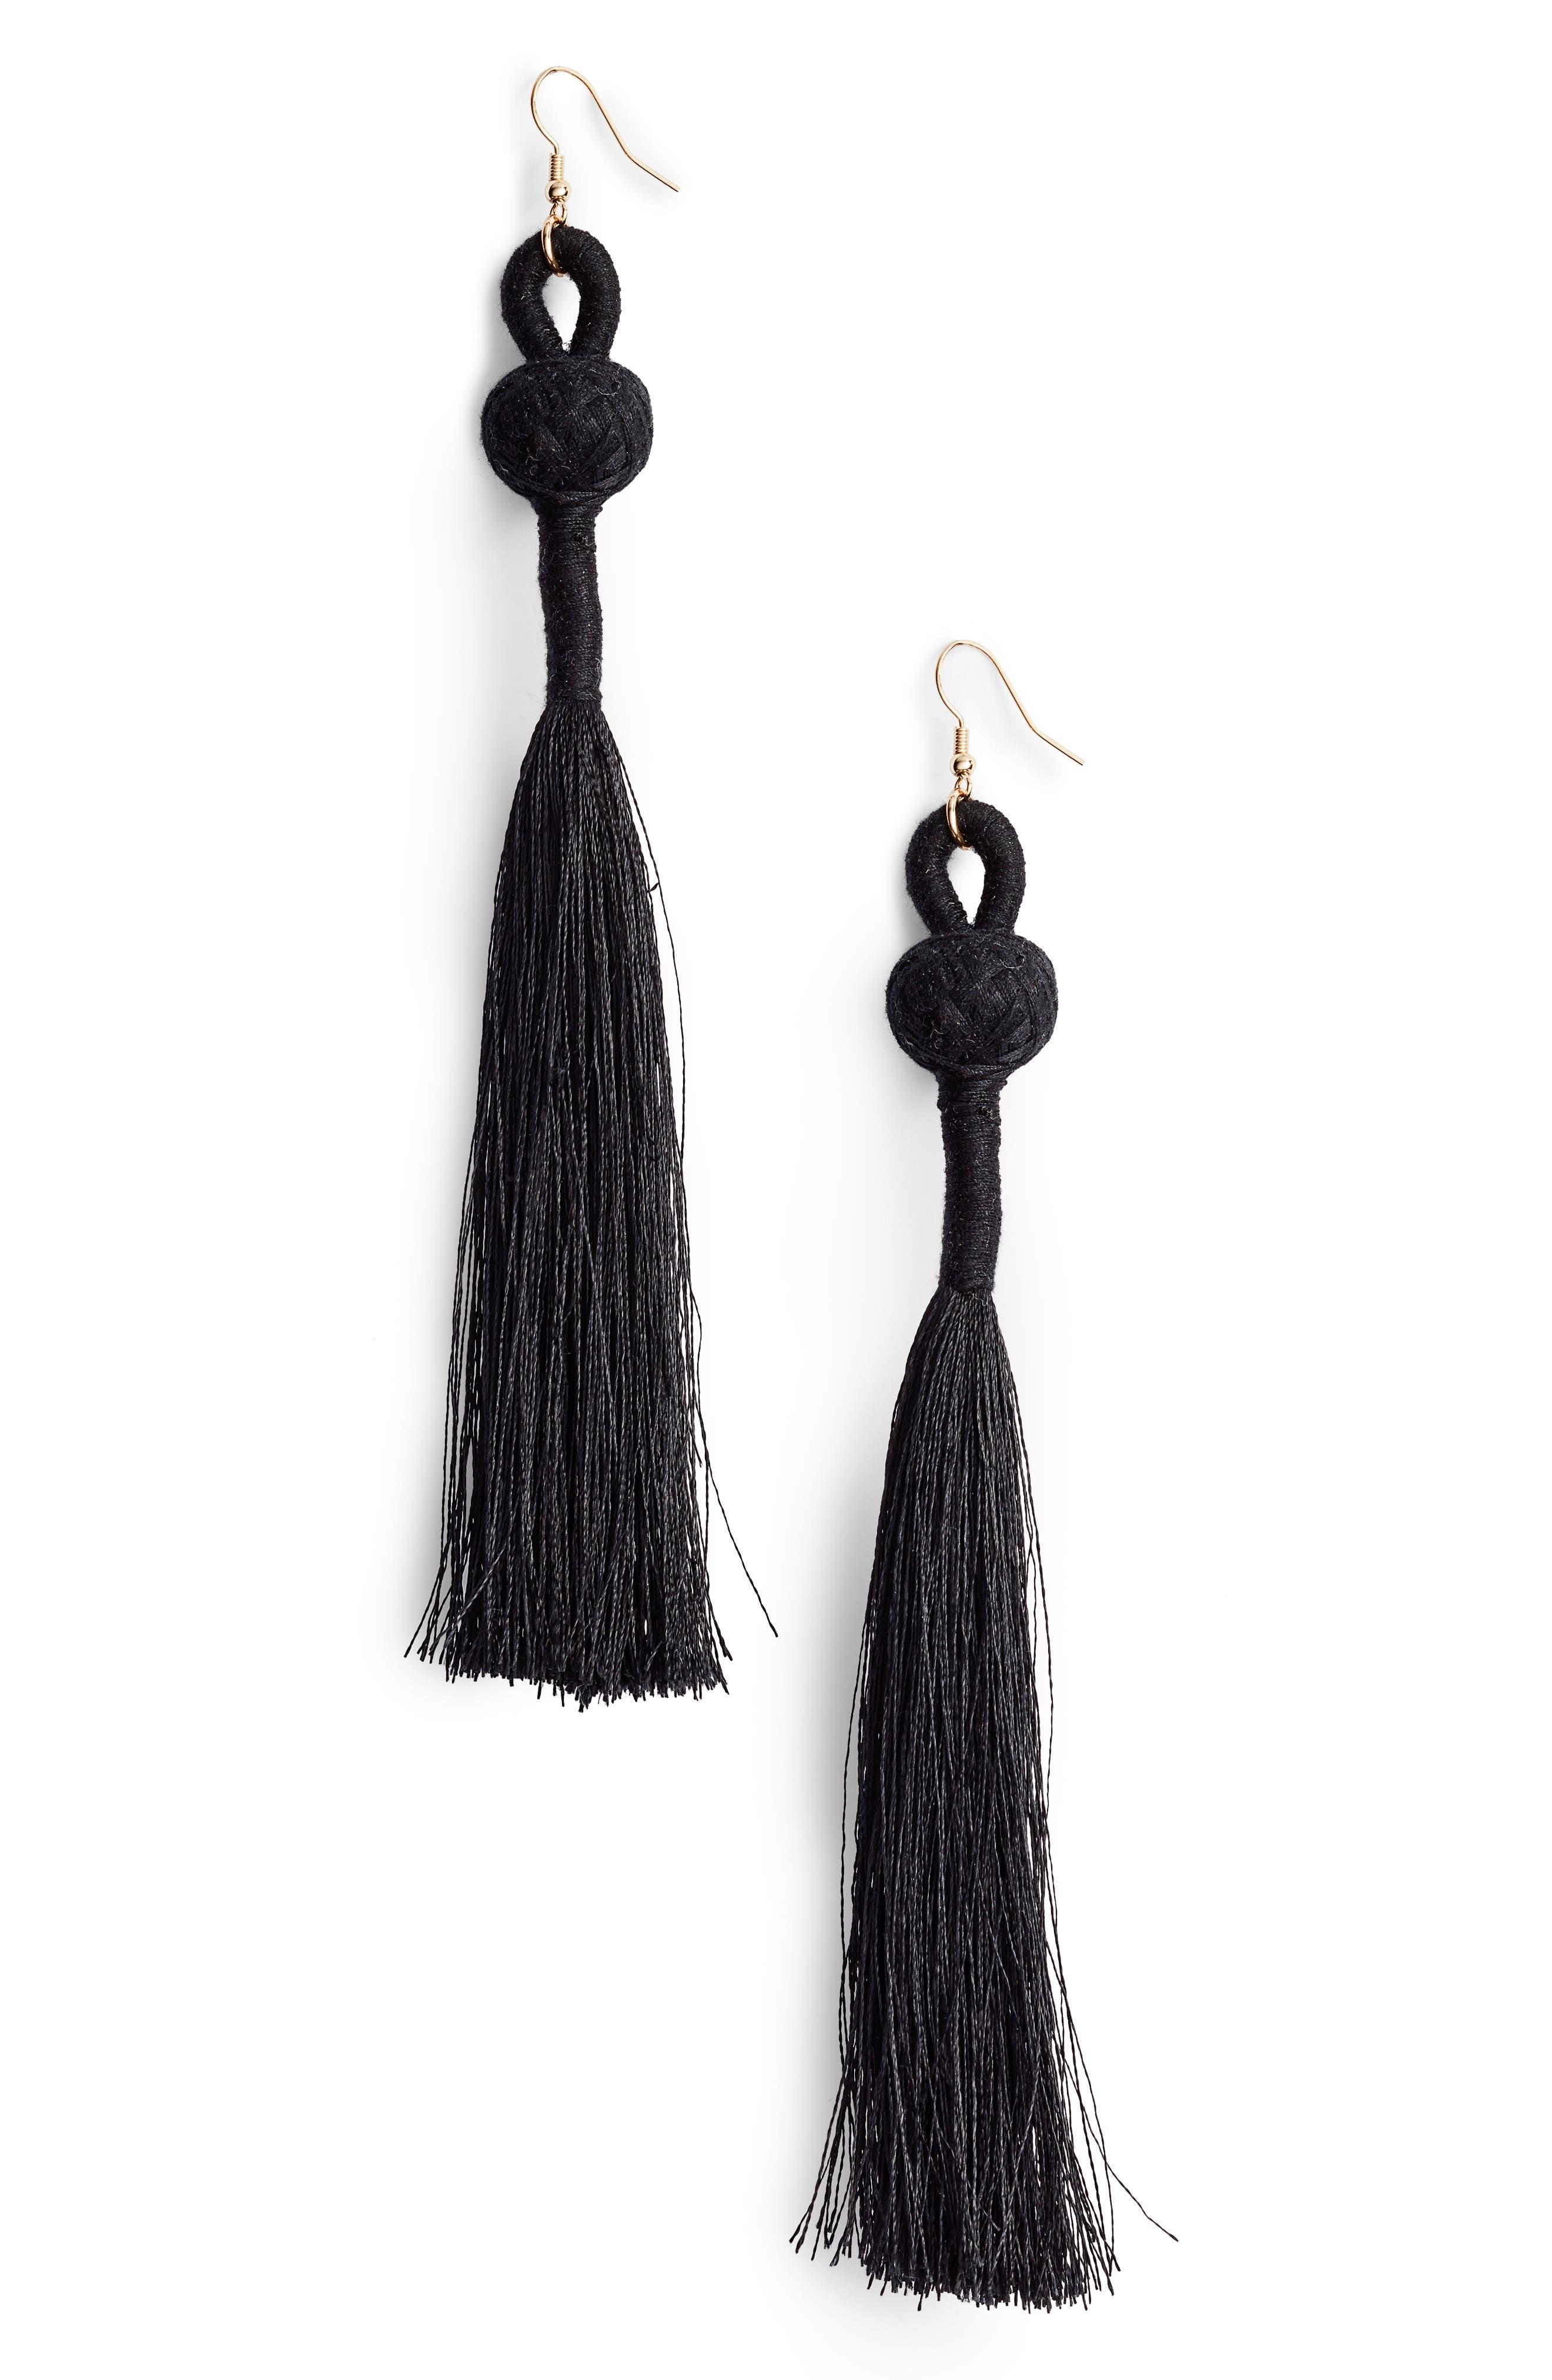 Loop Tassel Earrings,                             Main thumbnail 1, color,                             Black